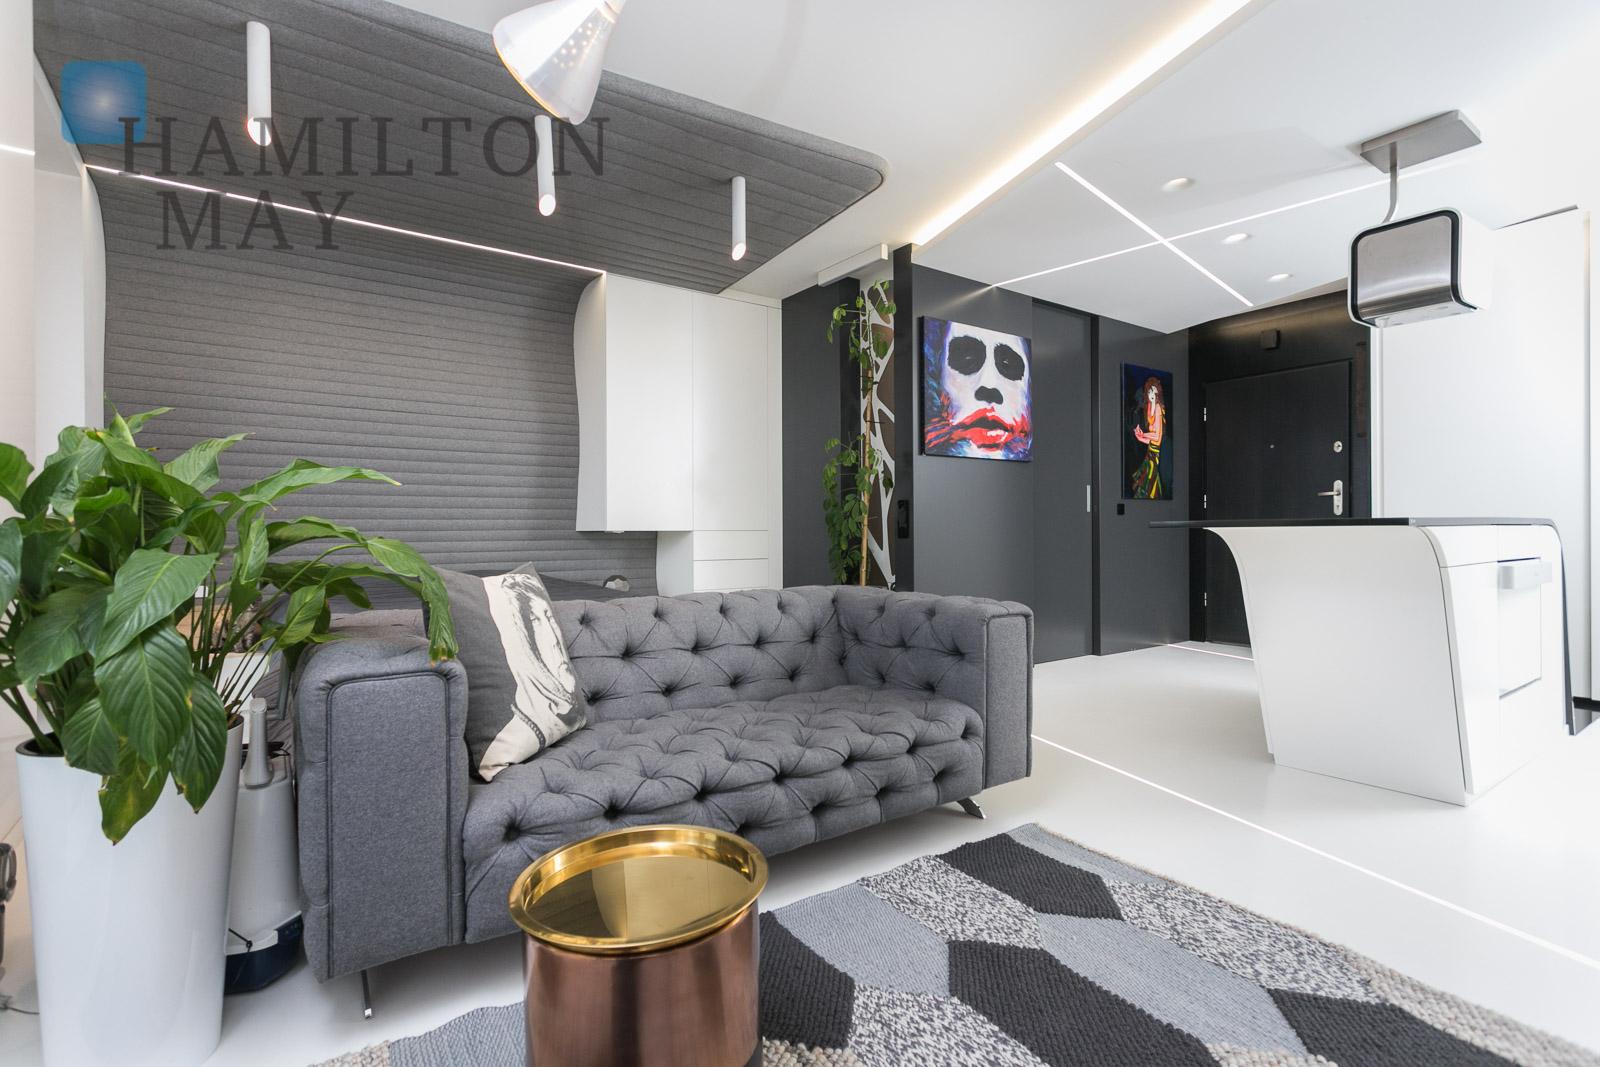 For rent modern studio apartment in Nadwiślańska 11 investment Krakow for sale